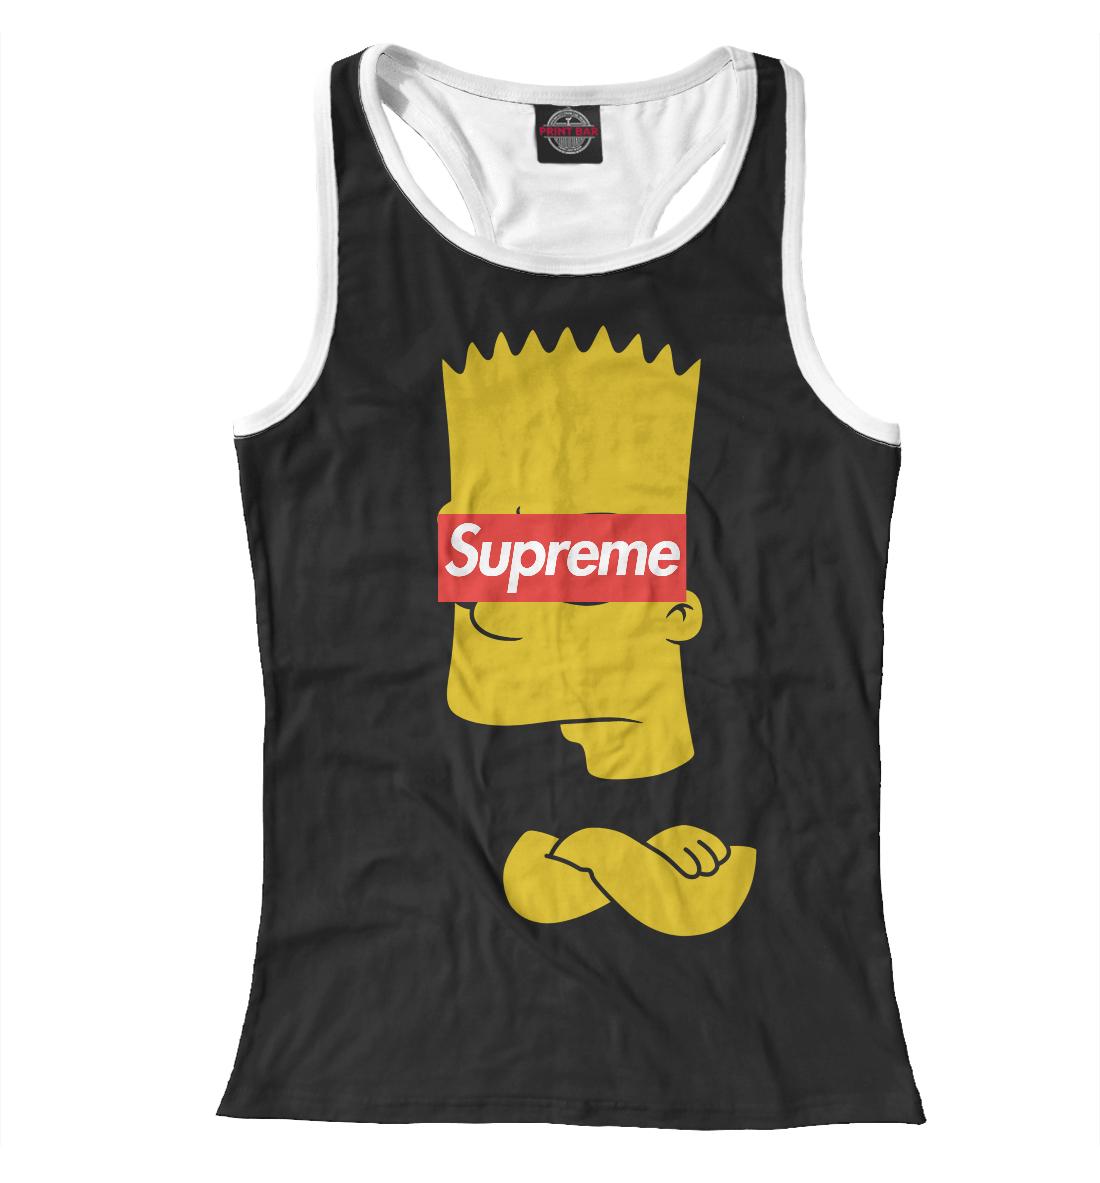 Купить Supreme Simpsons, Printbar, Майки борцовки, SPR-402256-mayb-1